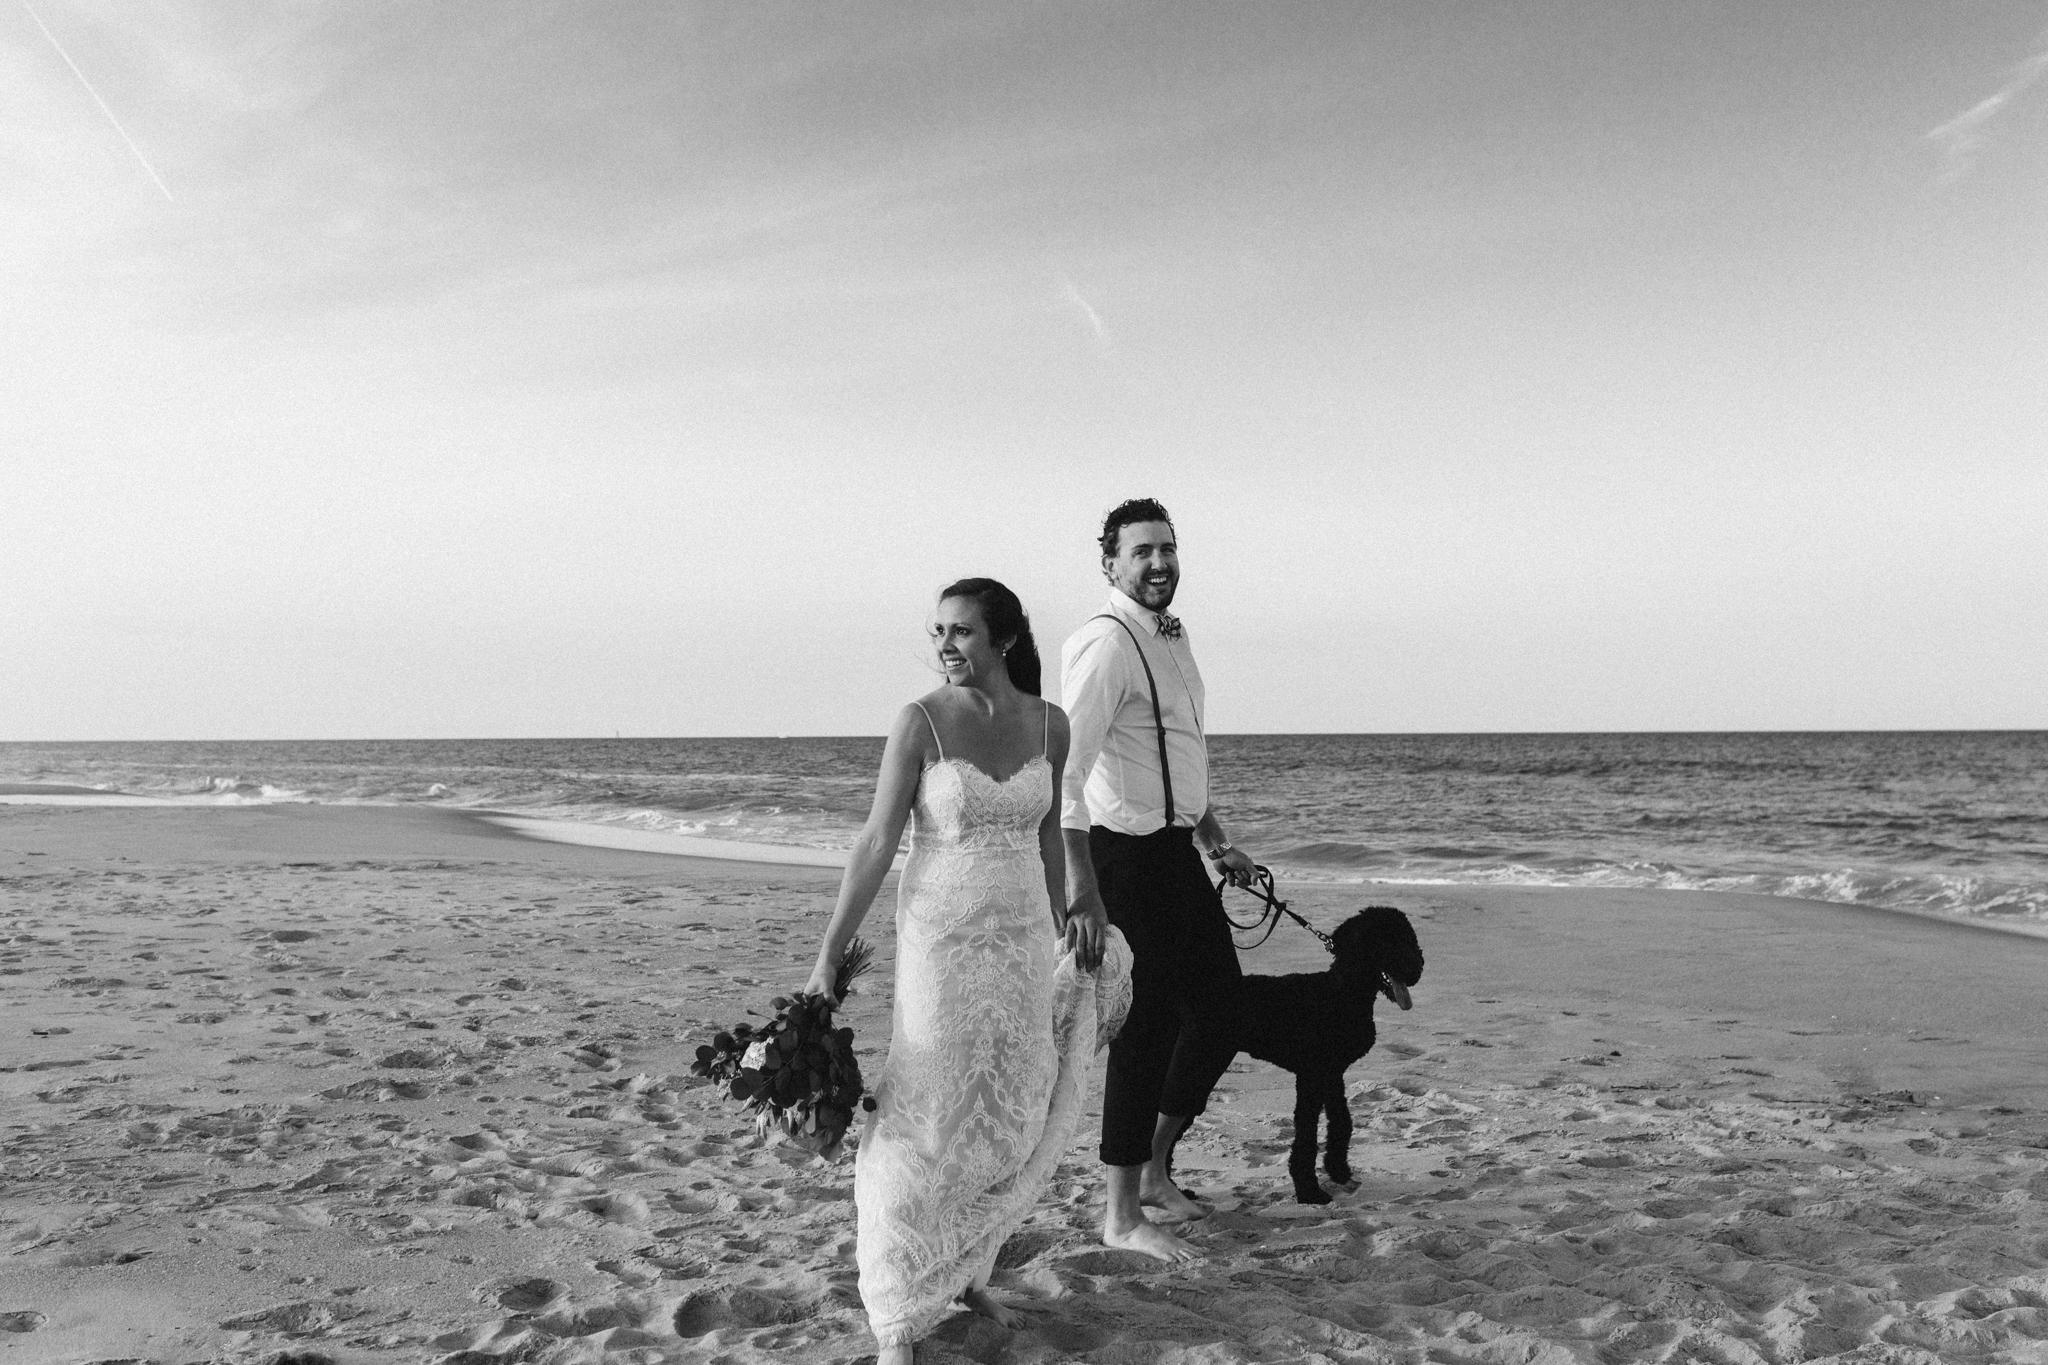 anniversary_virginia_beach_oceanfront_rebeccaburtphotography-22.jpg